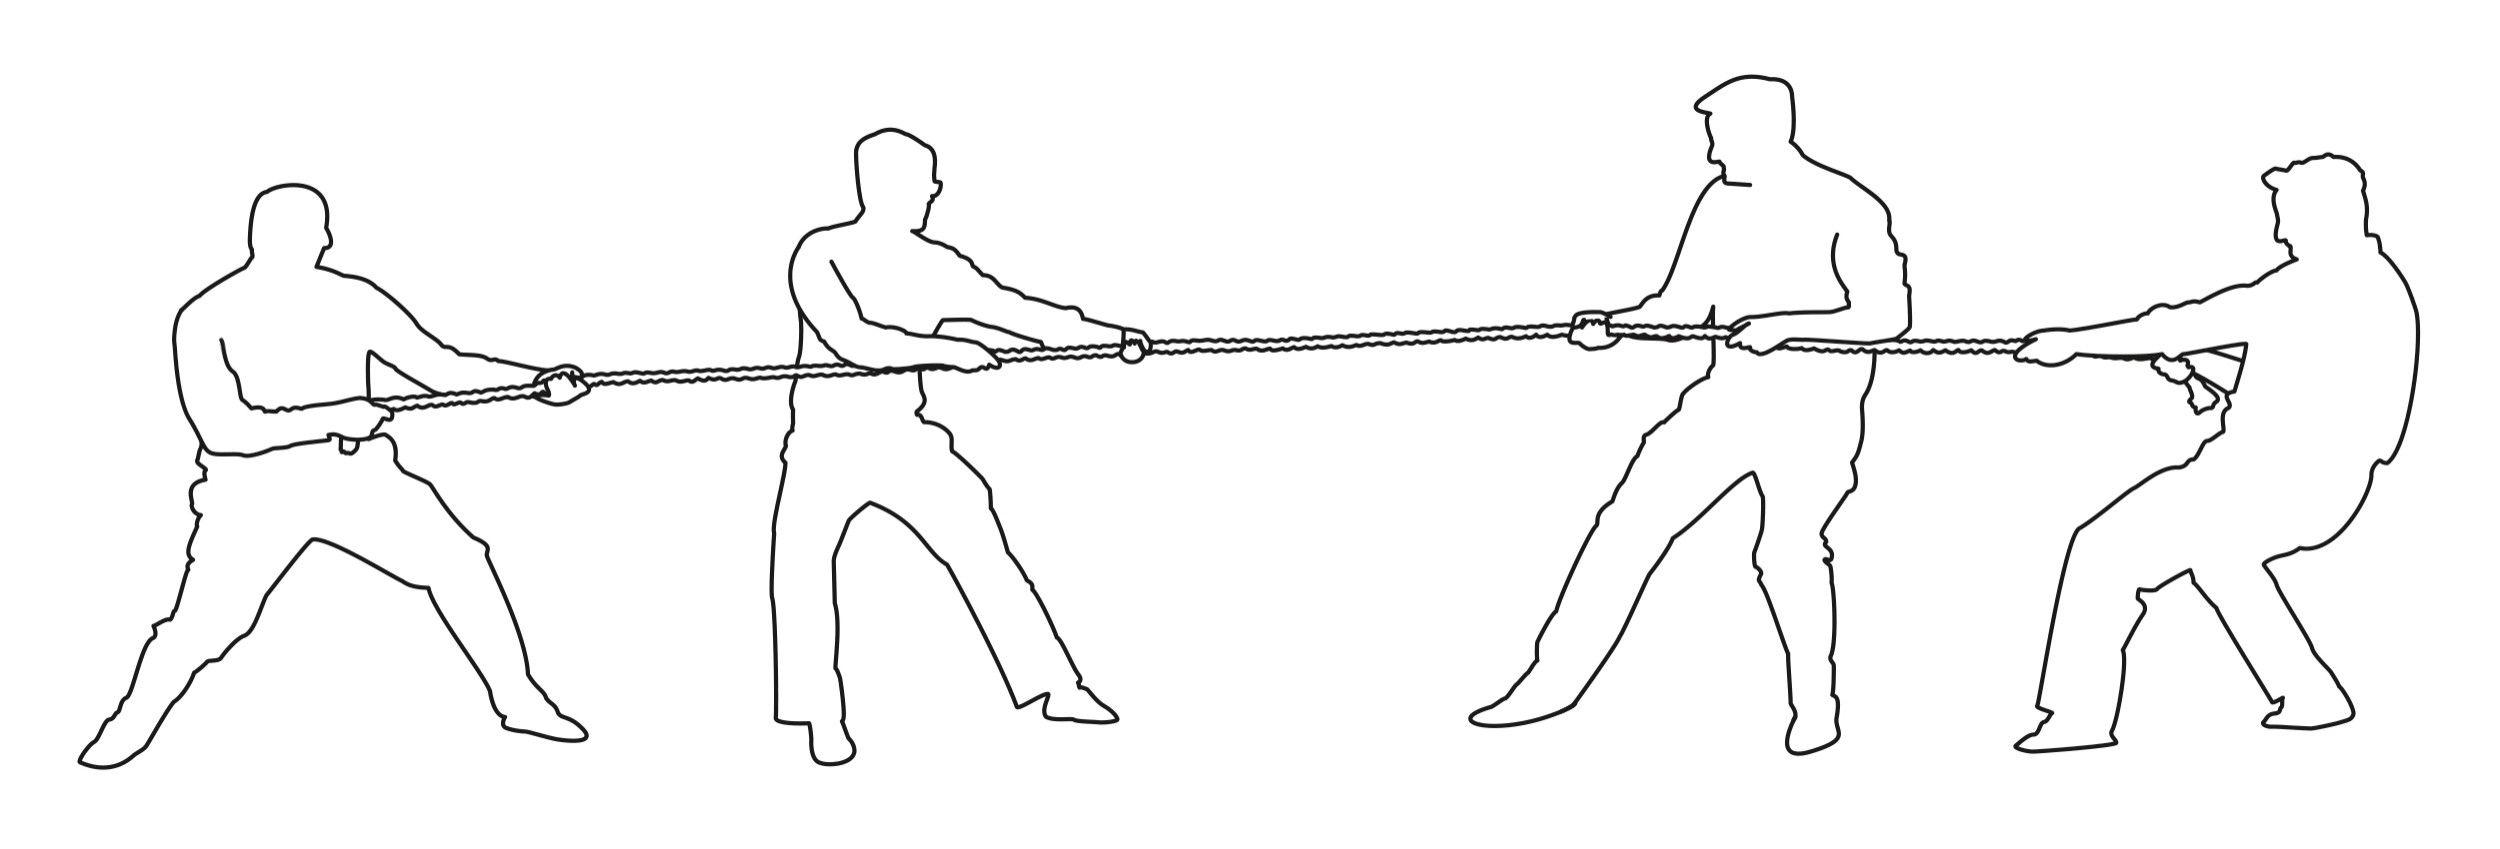 An illustration of figures playing tug-of-war.